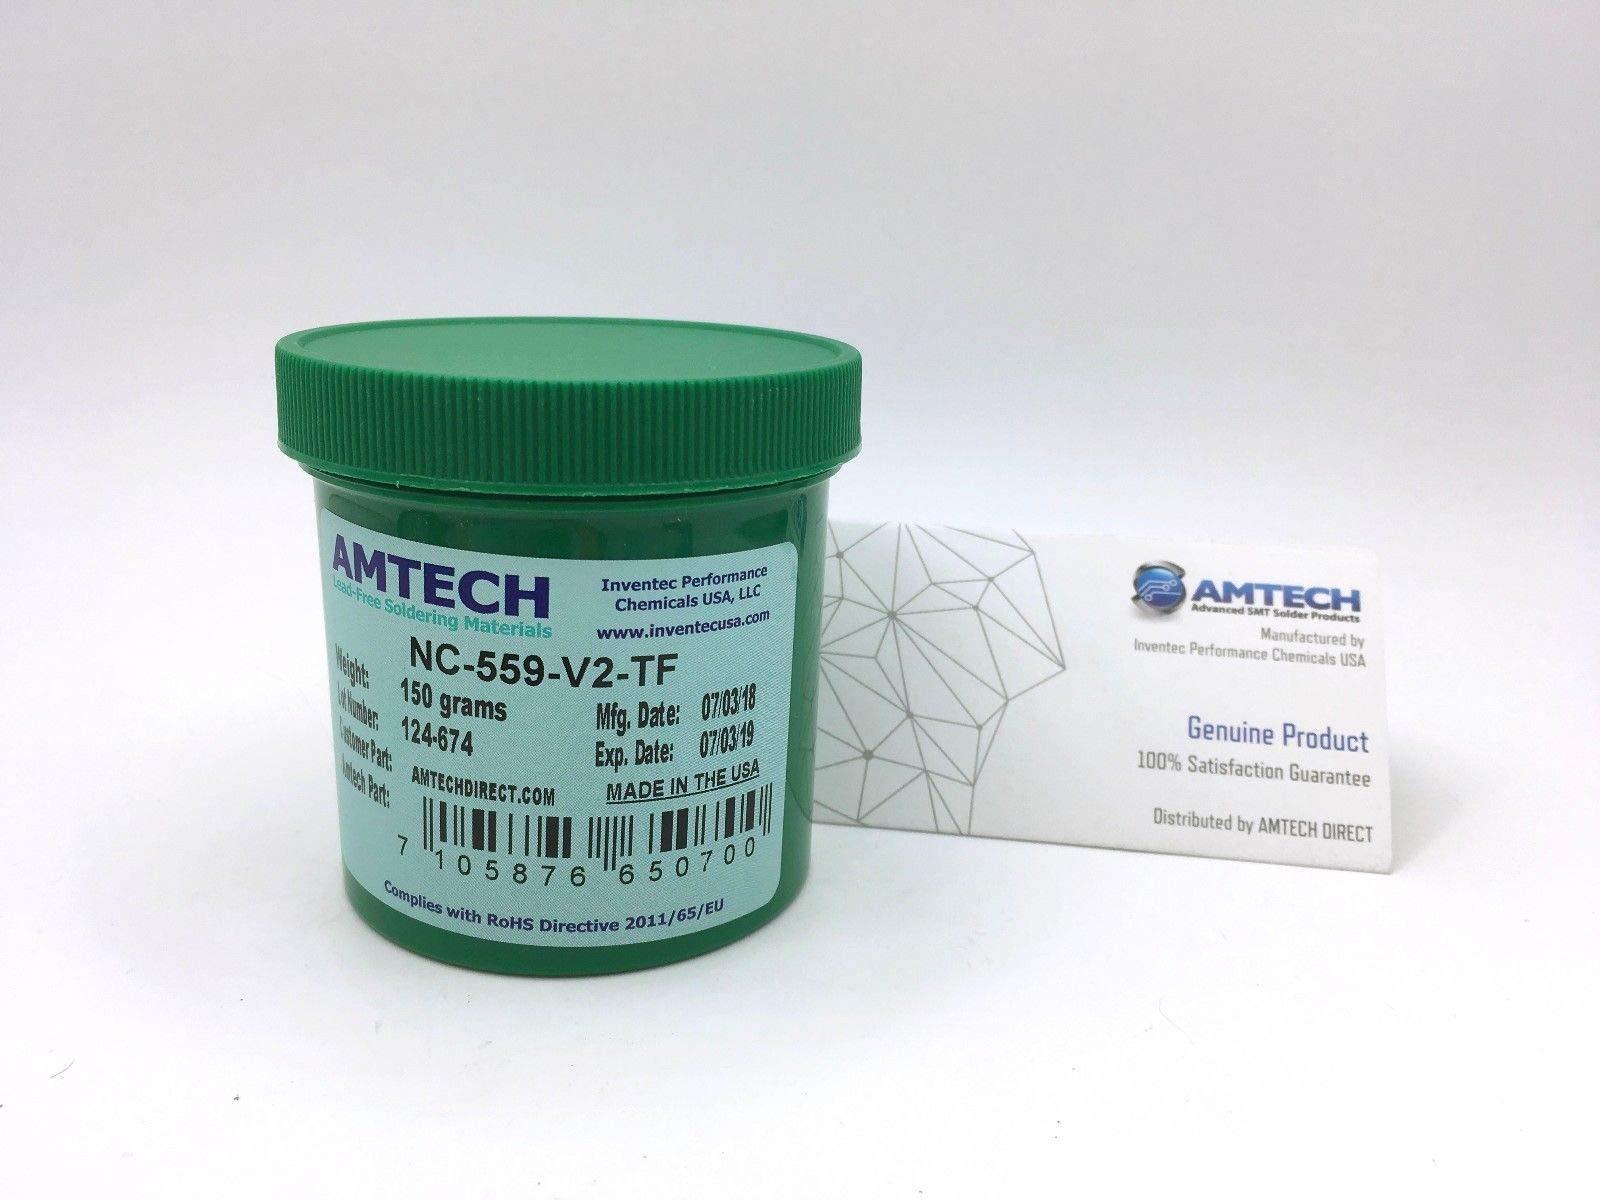 AMTECH NC-559-V2-TF no-clean tacky solder flux (ROL0) 150g jar USA 16145